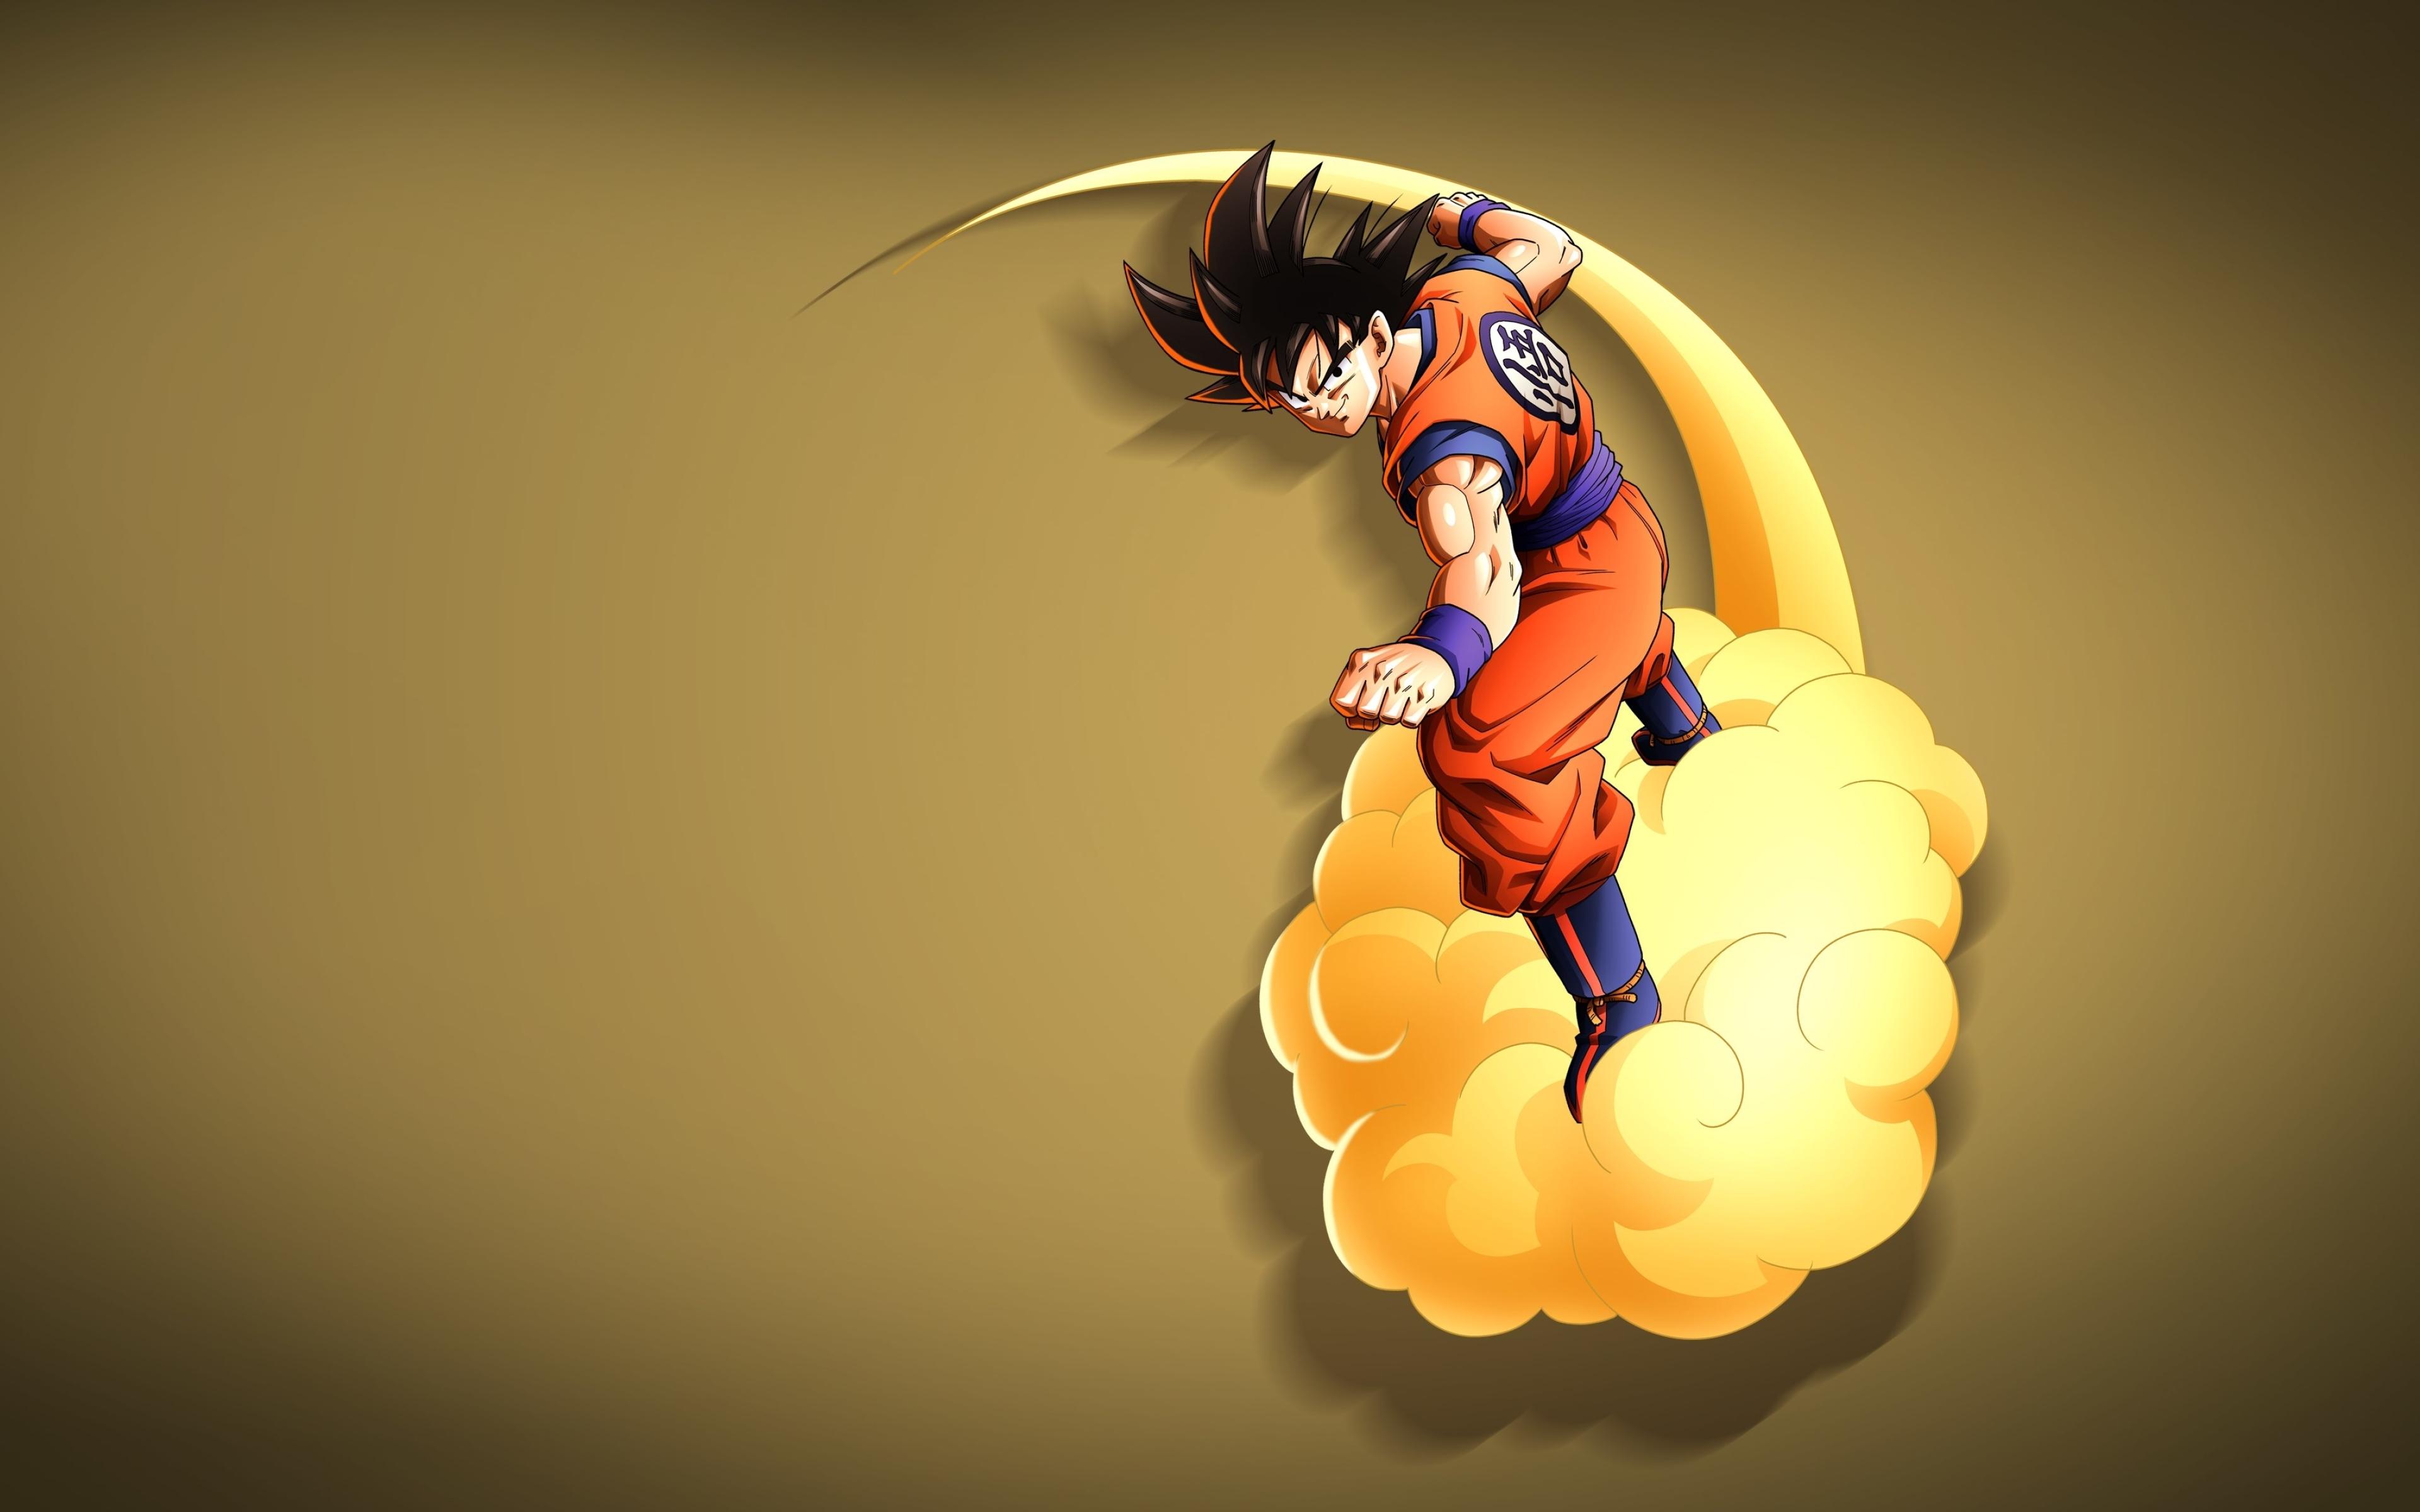 3840x2400 Dragon Ball Z Kakarot UHD 4K 3840x2400 ...